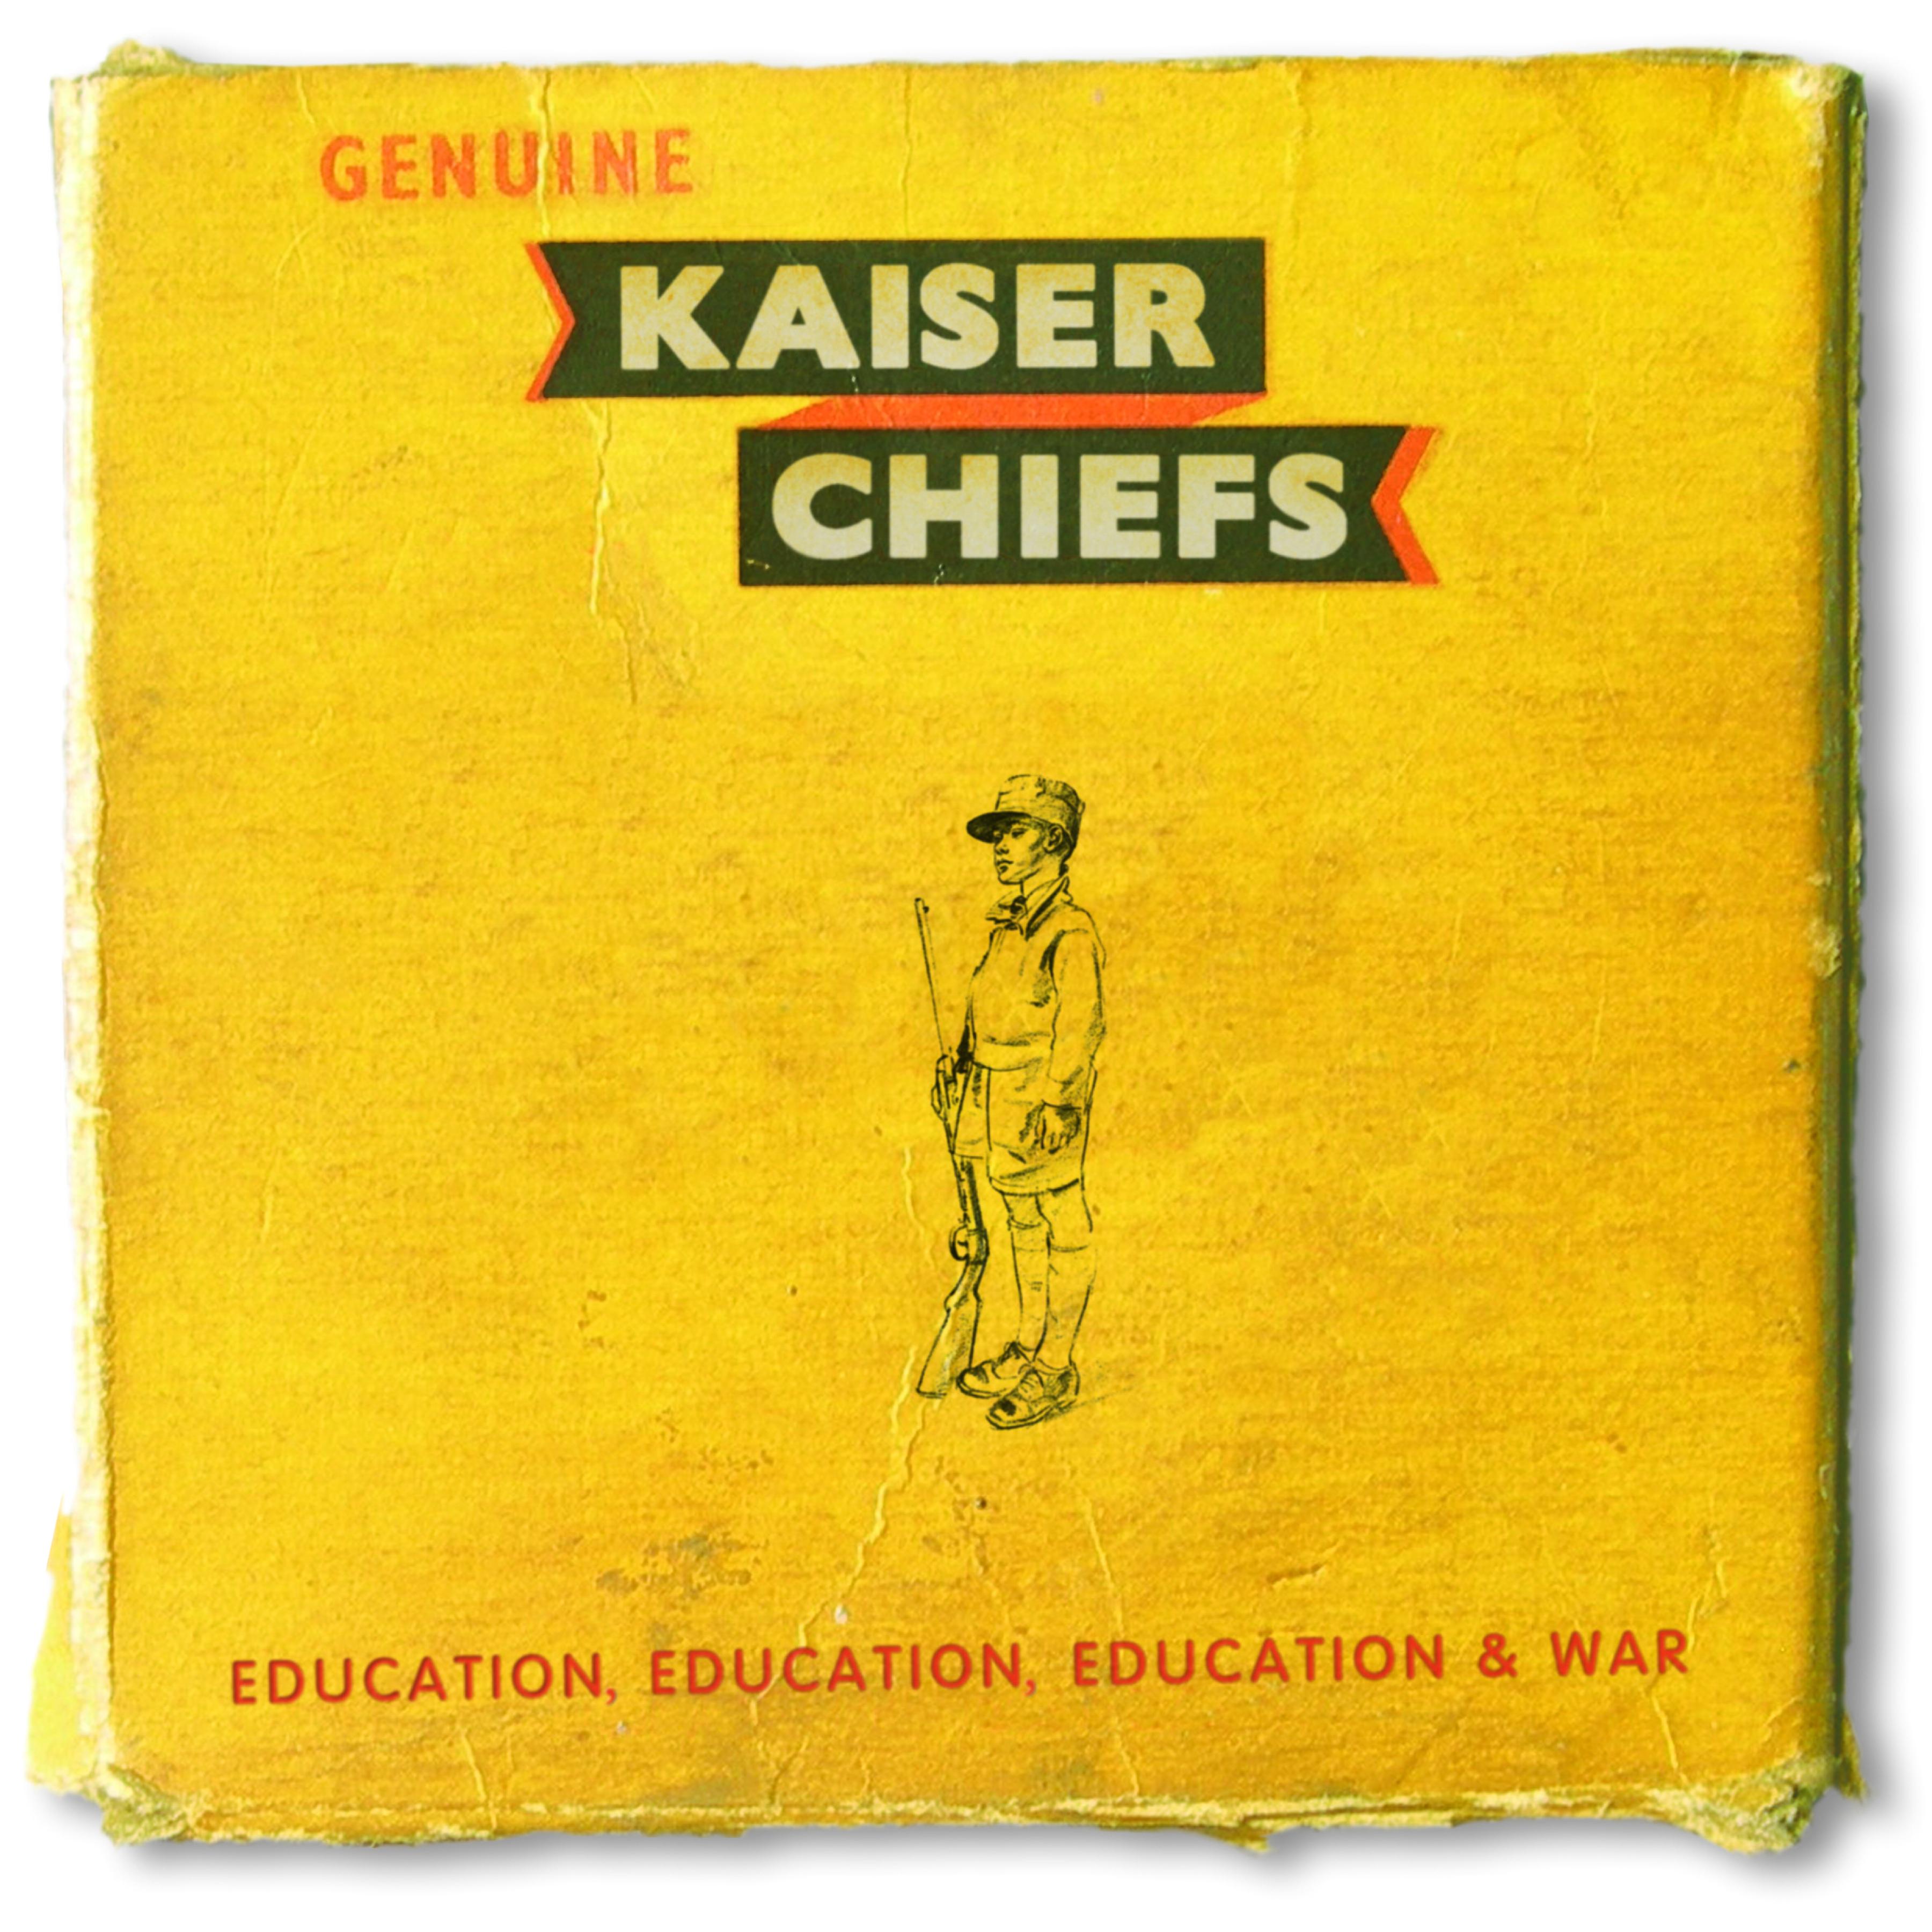 Kaiser Chiefs - Education, Education, Education & War  Digital Album